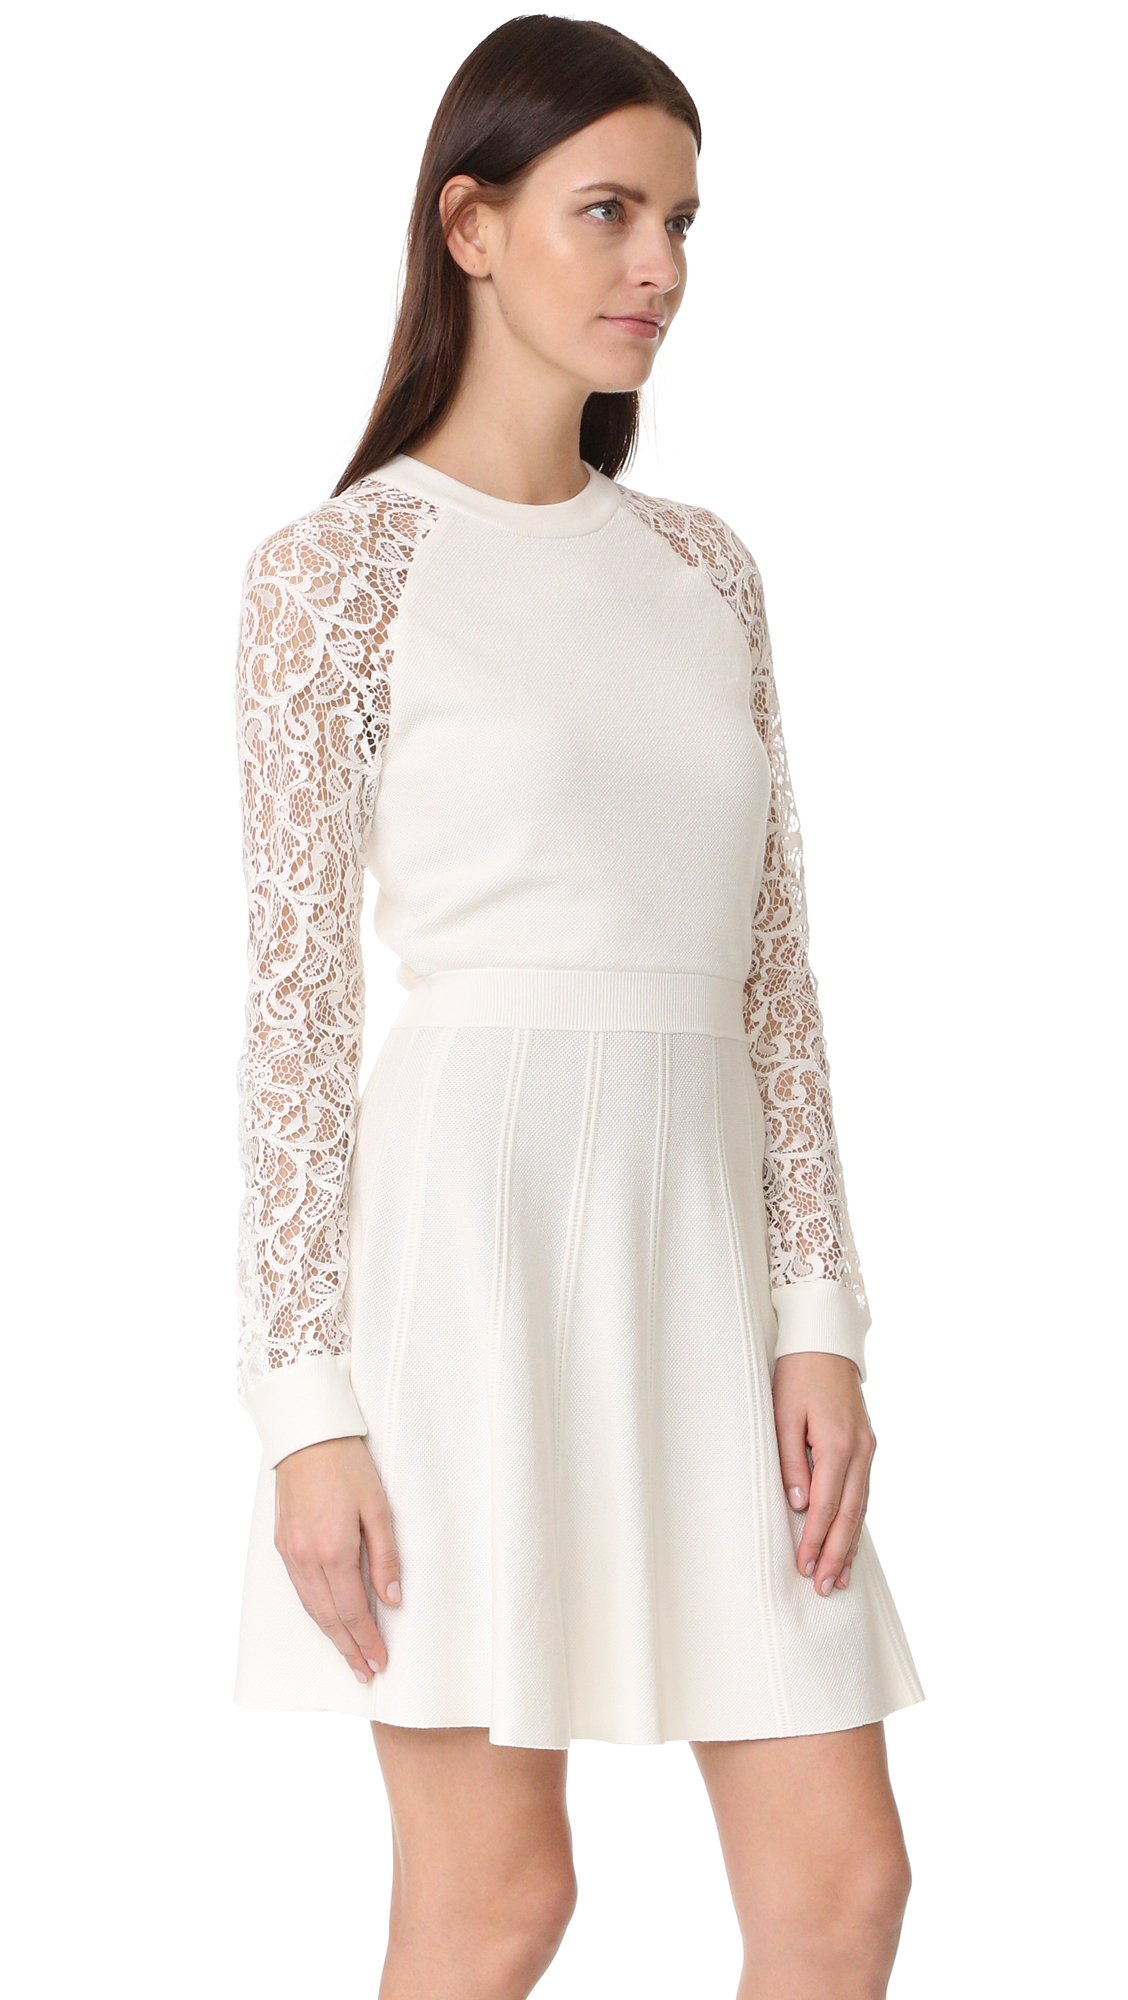 Alice and olivia lace white dress